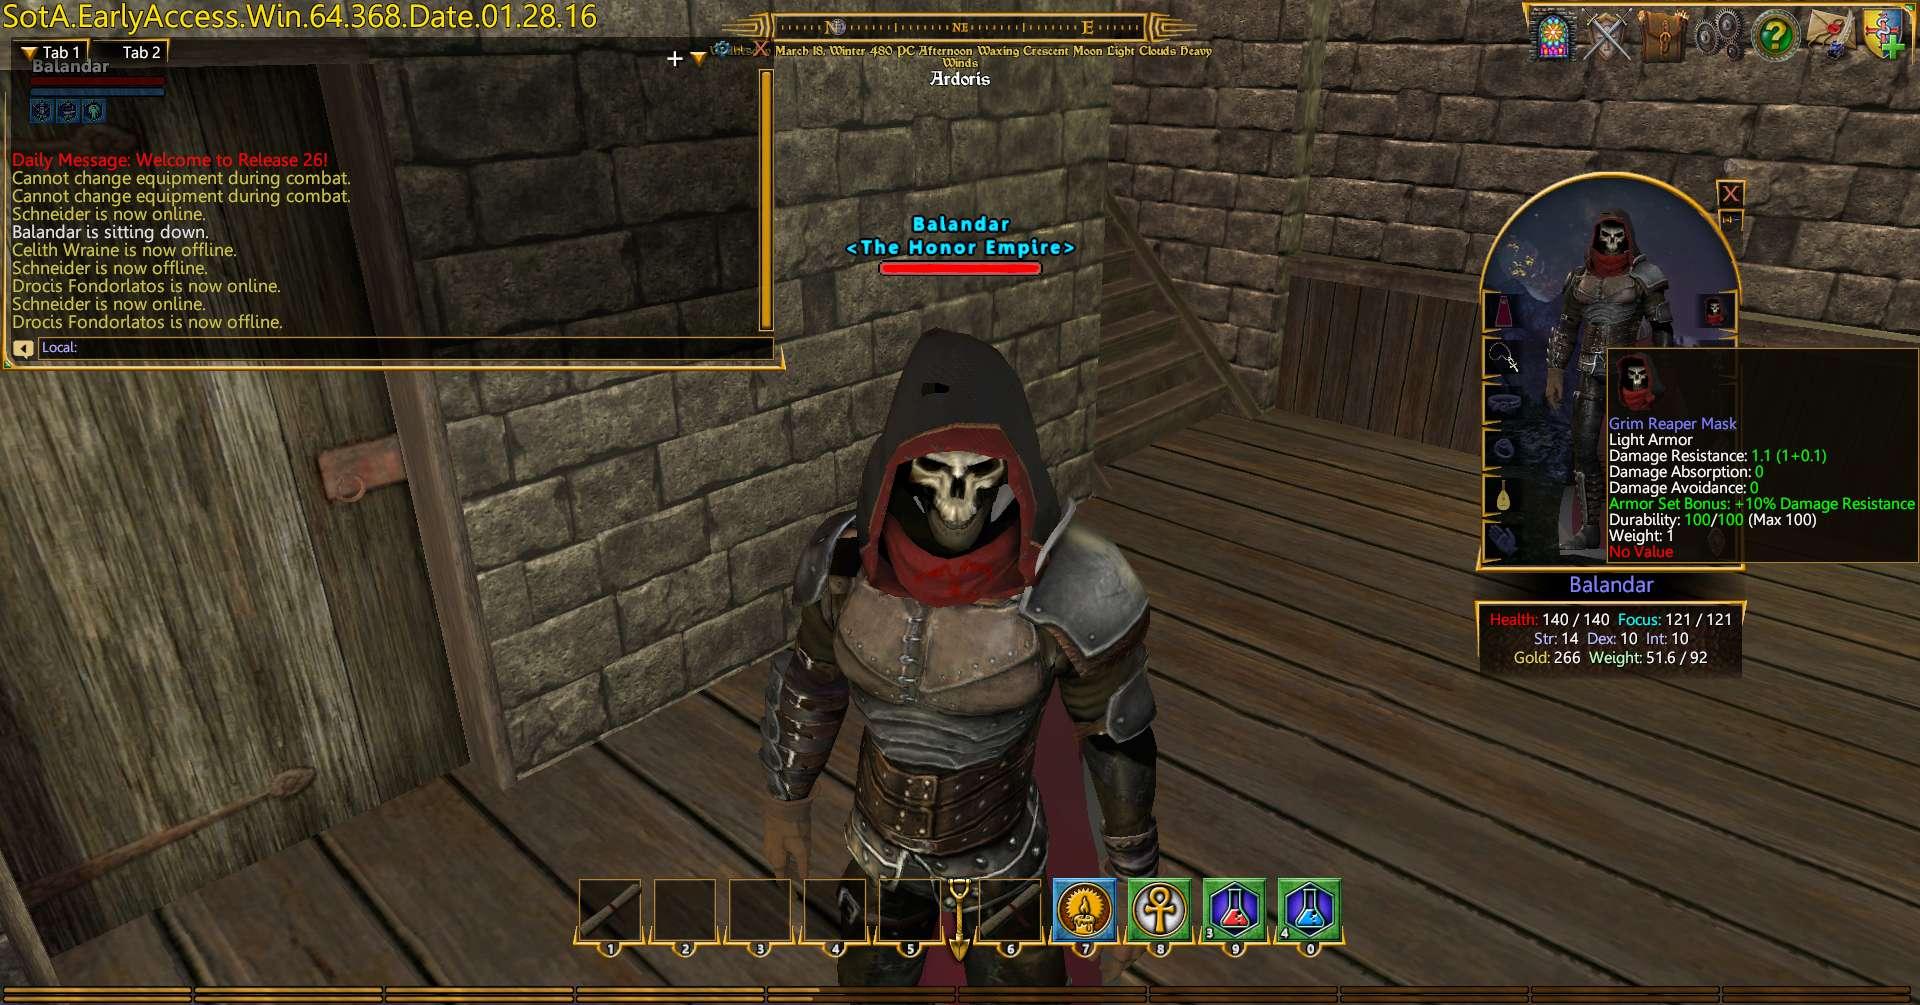 Grim Reaper Mask | Shroud of the Avatar Forum